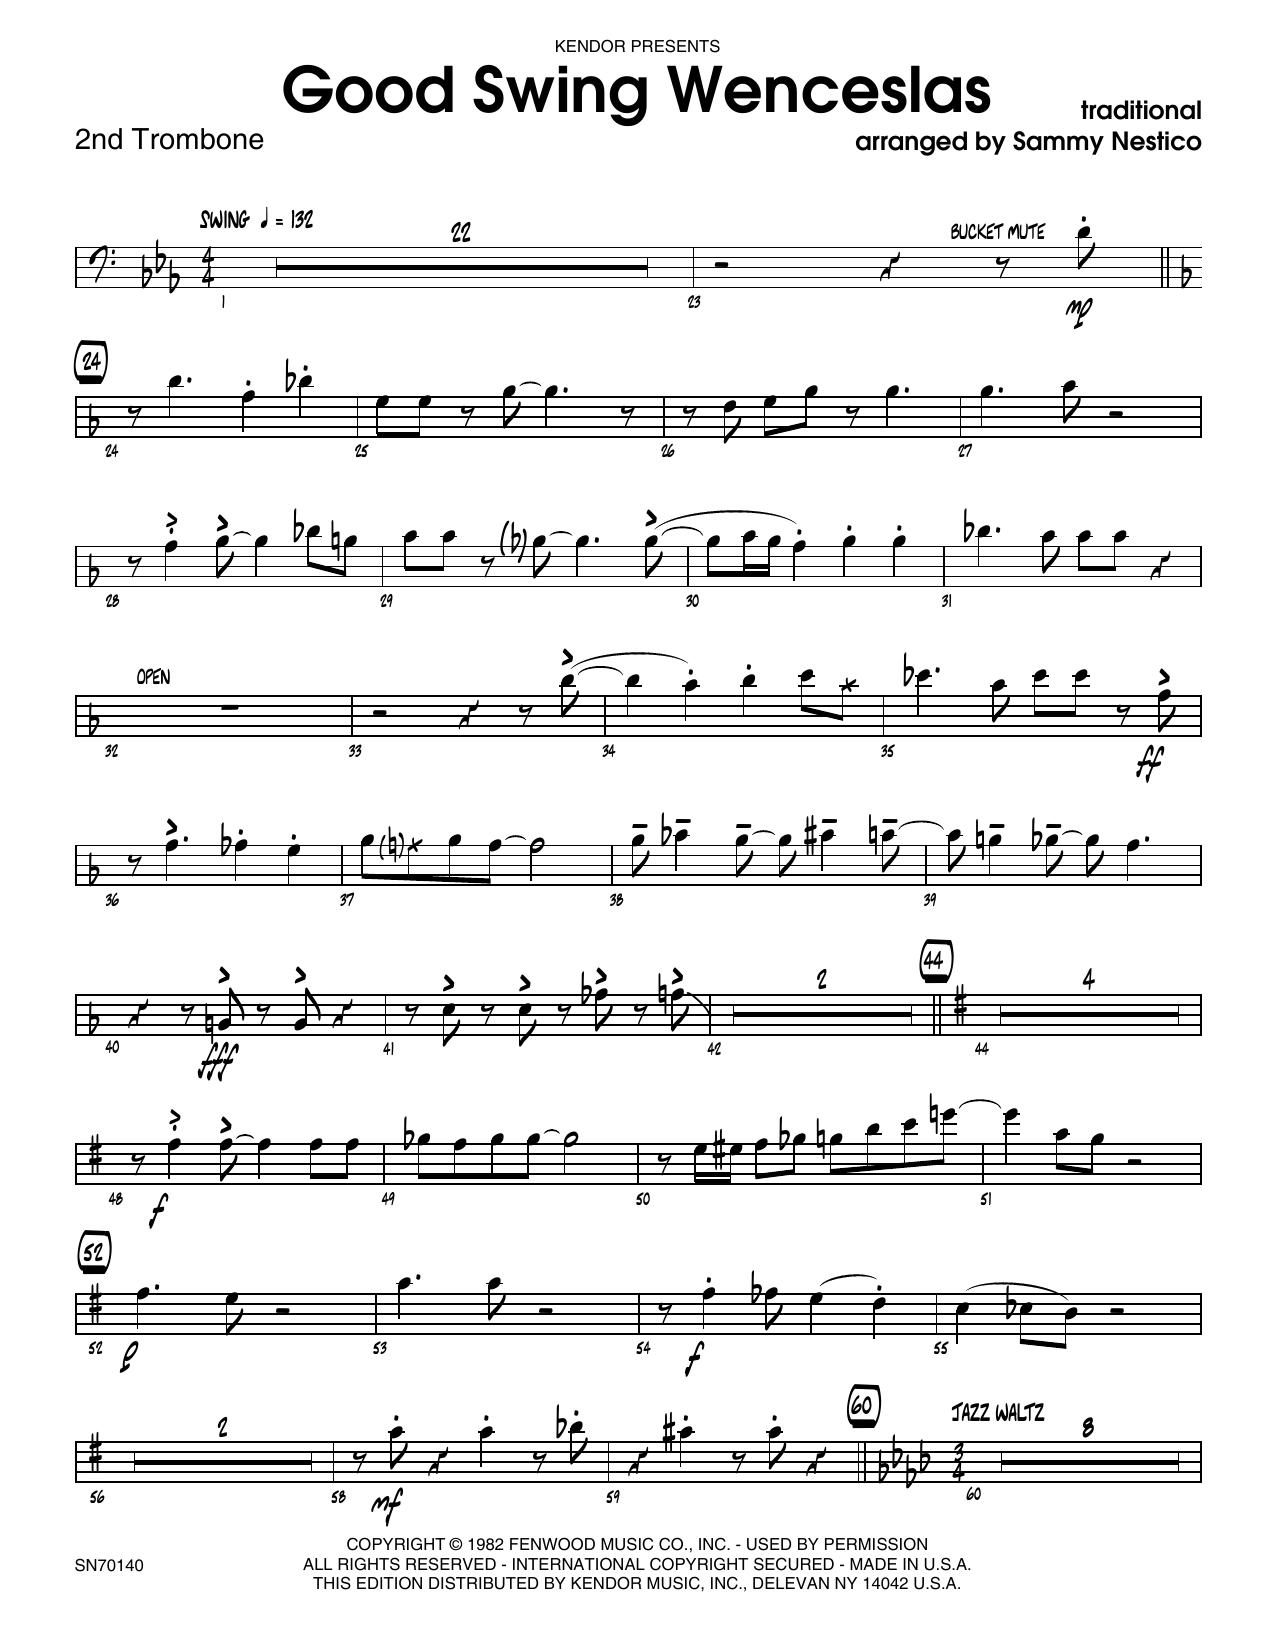 Good Swing Wenceslas - 2nd Trombone Sheet Music